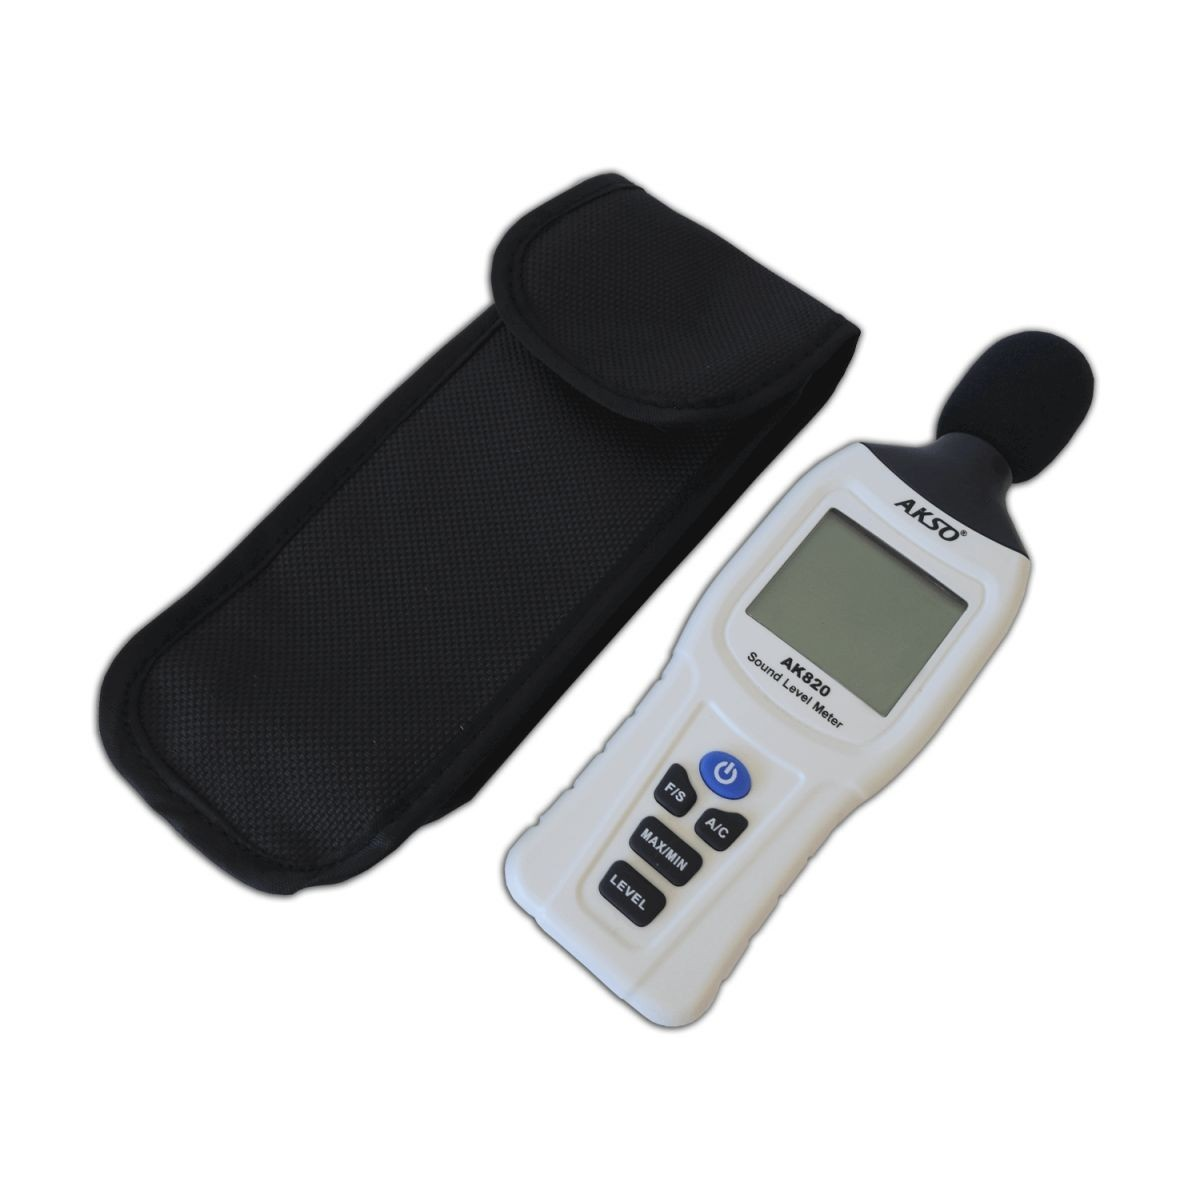 Decibelímetro Digital - AK820